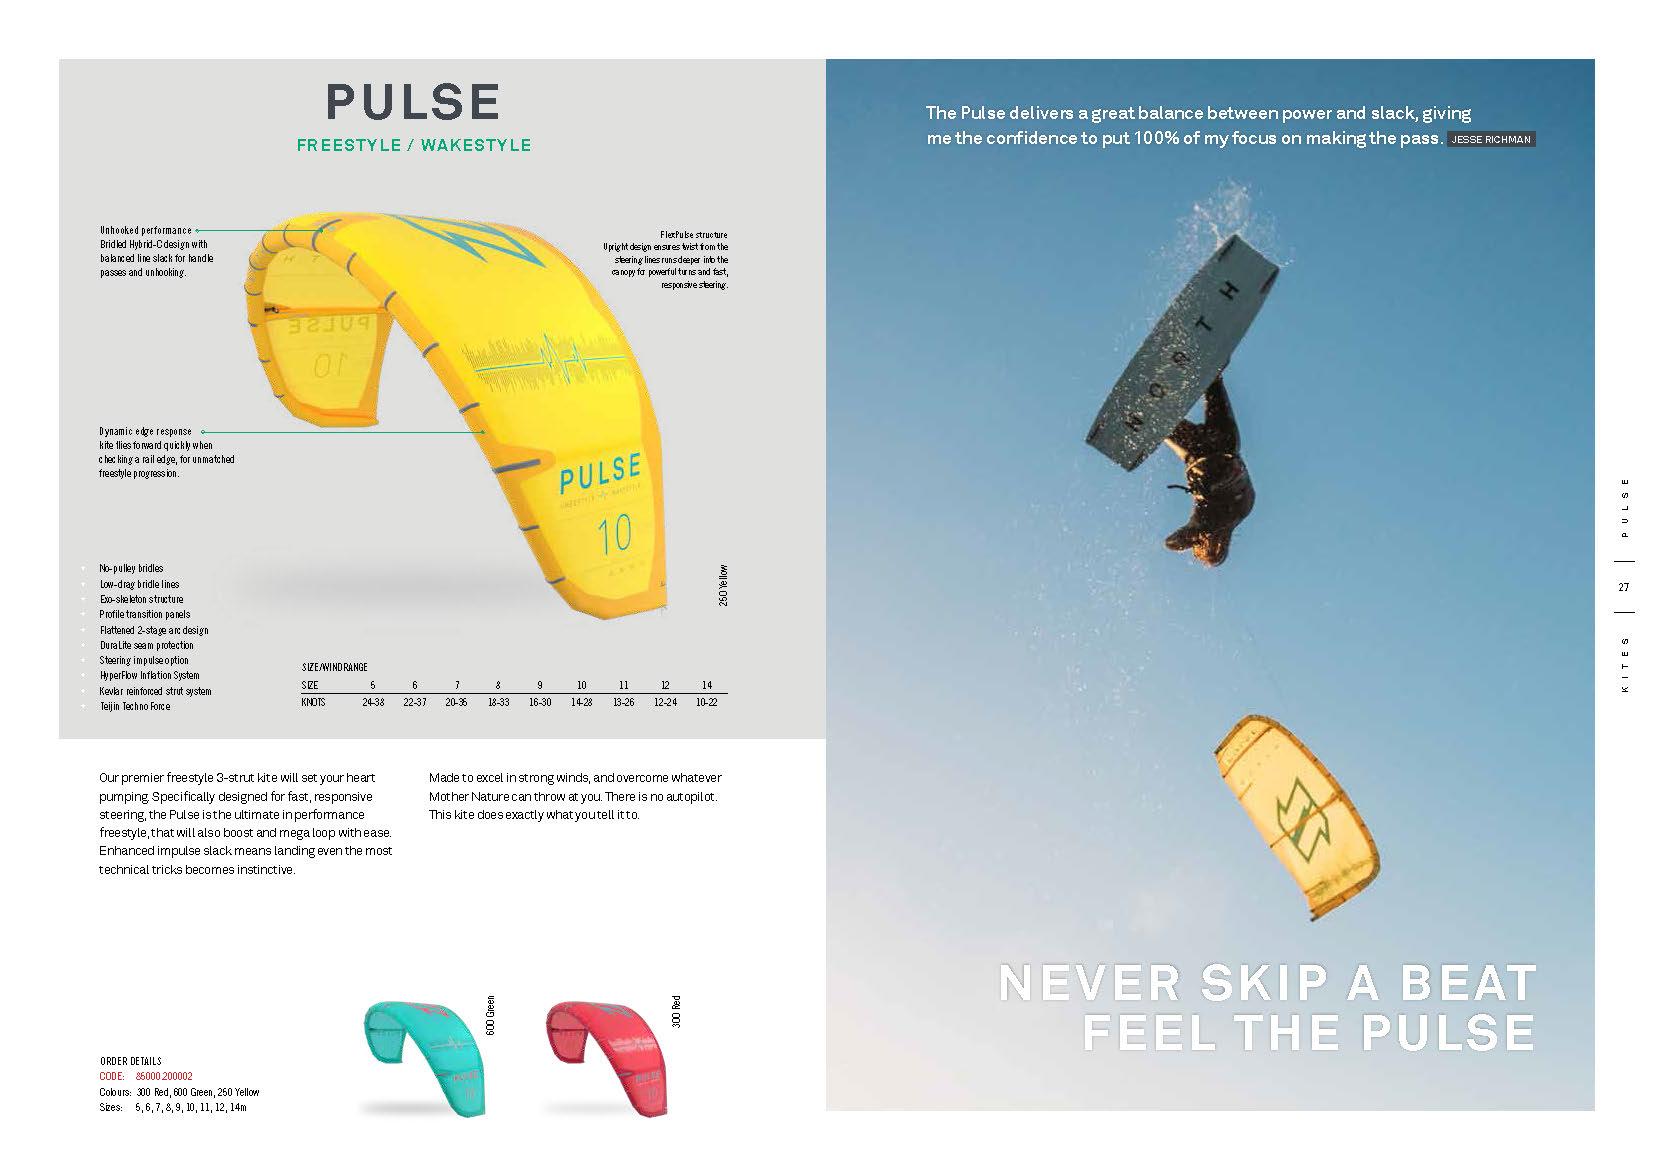 North_kite_pulse-2020-aile-de-kitesurf